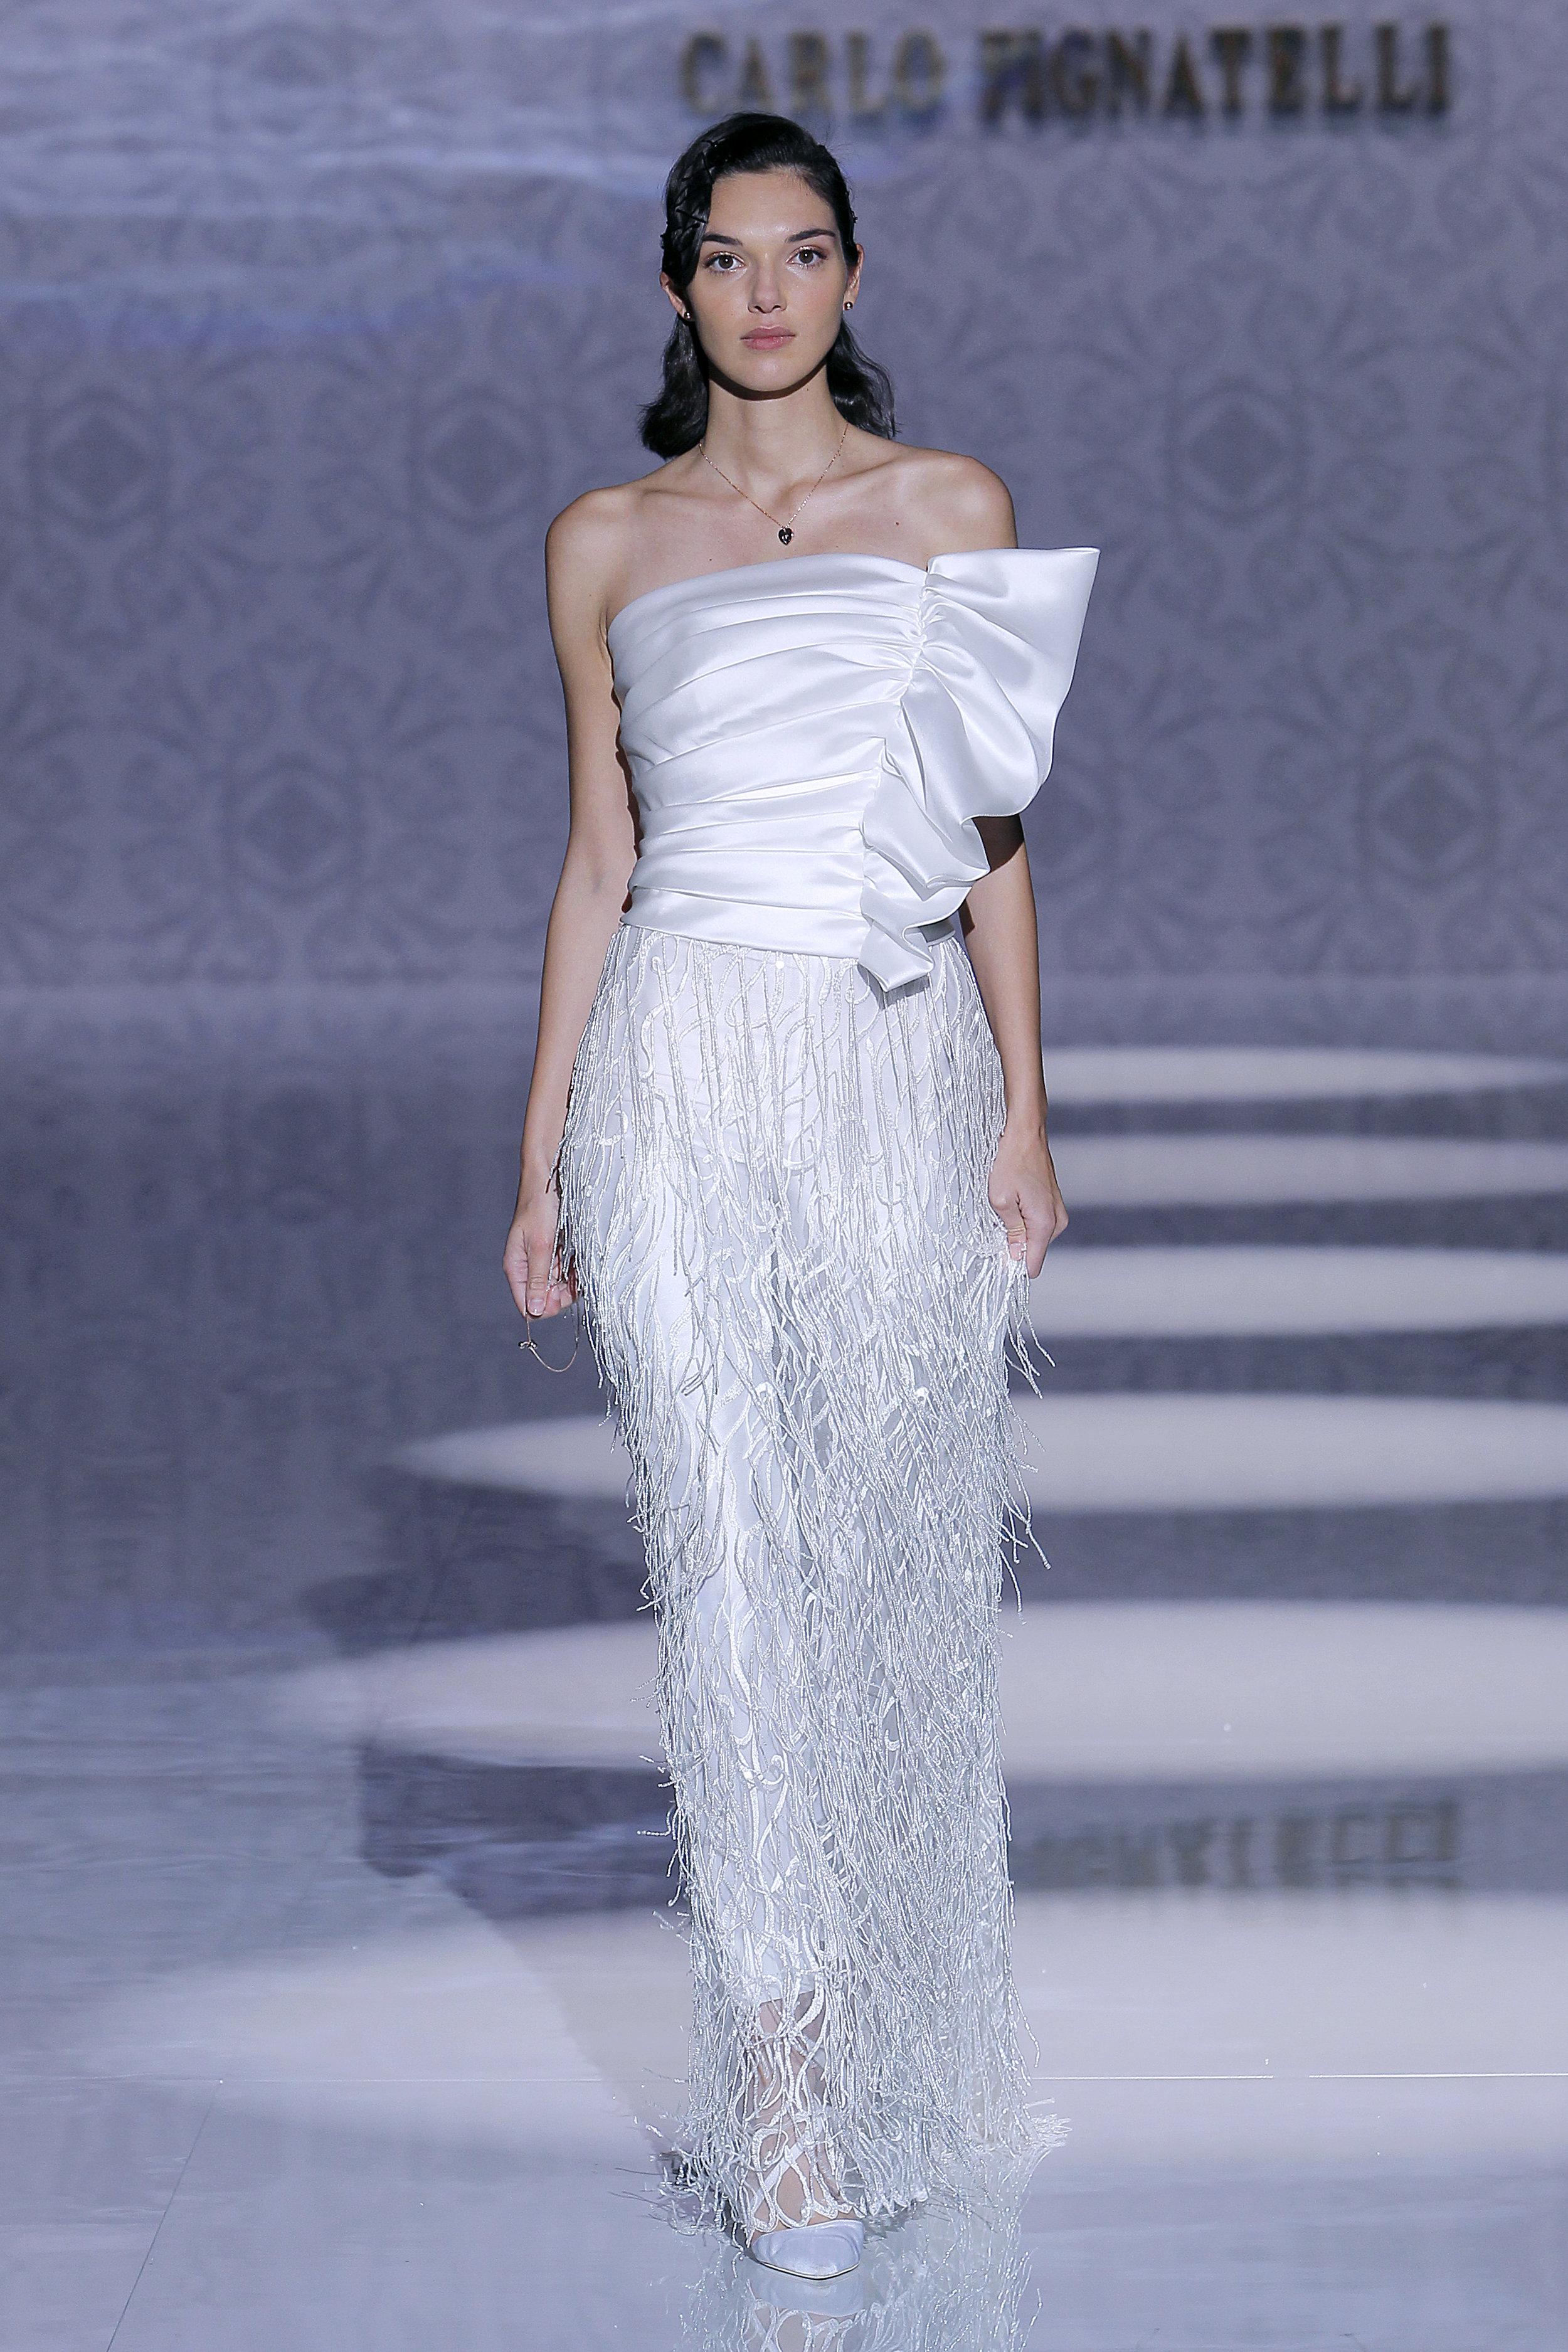 Diseñador: Carlo Pignatelli - Pasarela:   Valmont Barcelona Bridal Fashion Week